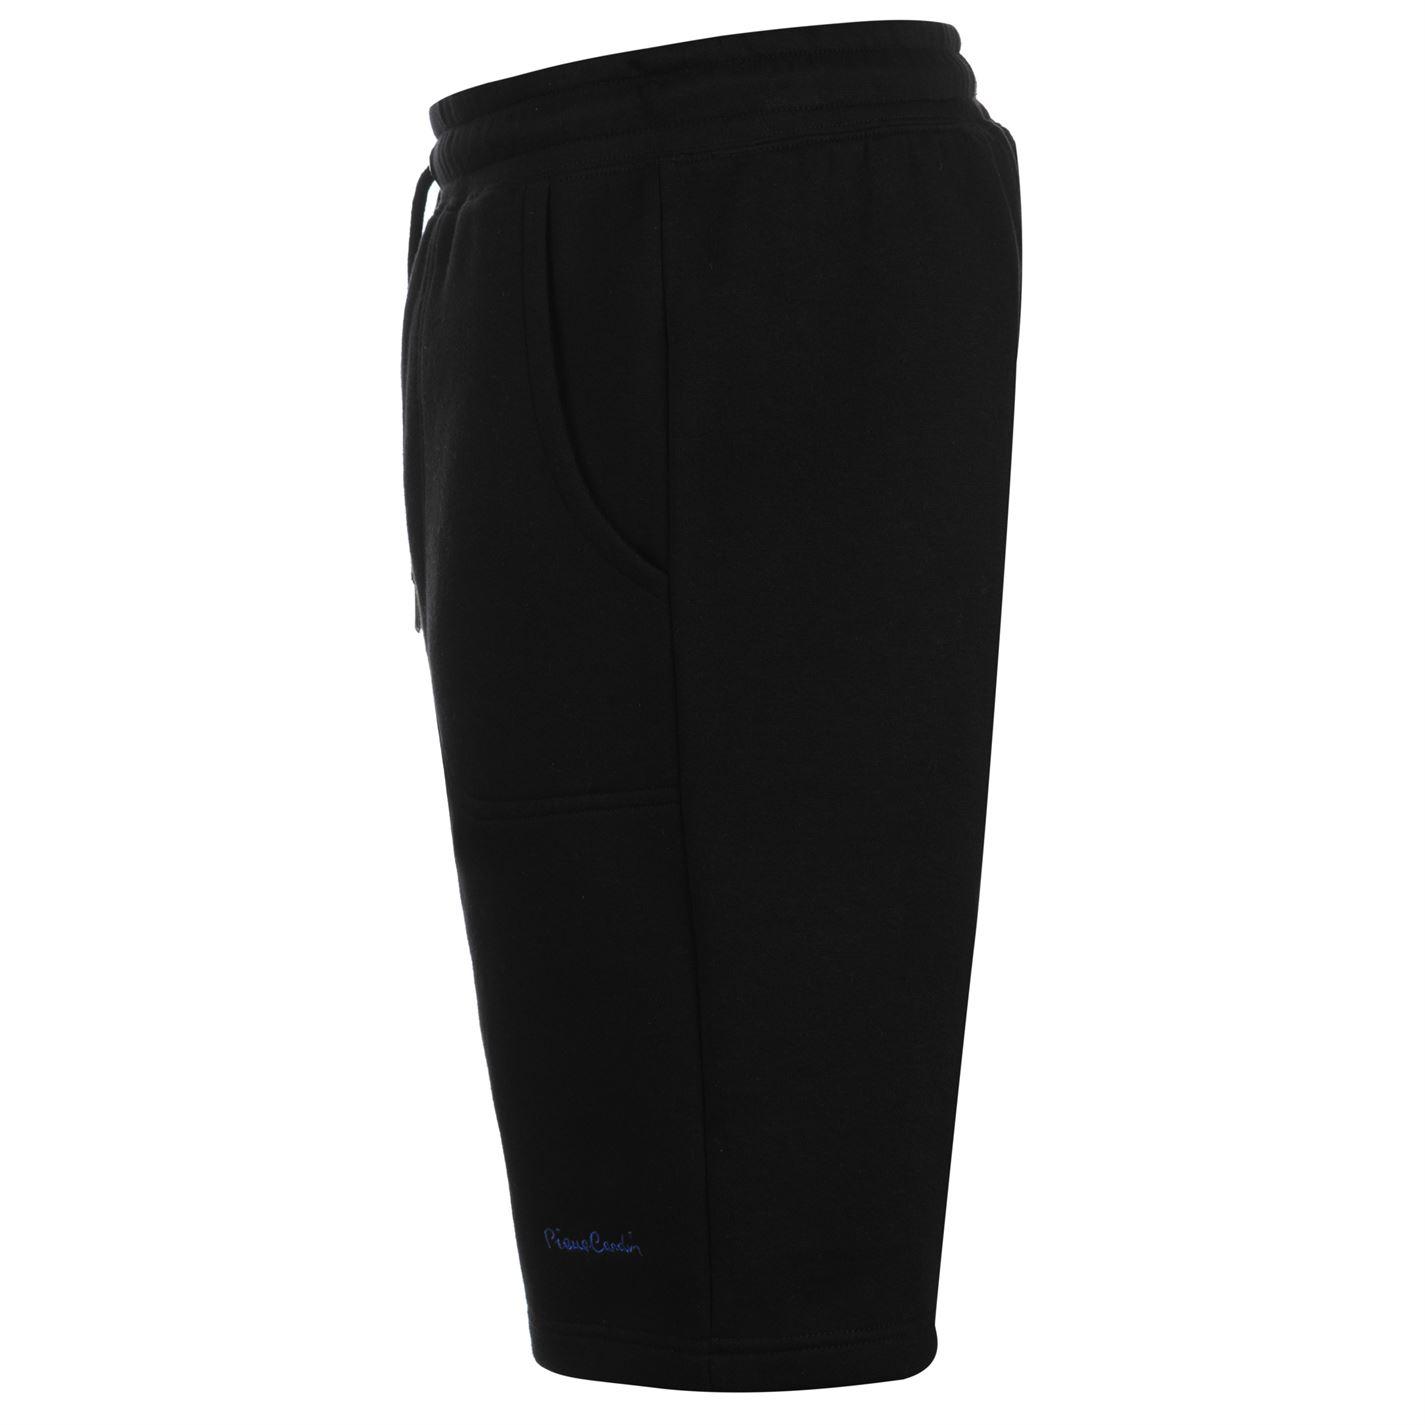 Pierre Cardin Mens C Solid Short Fleece Shorts Pants Trousers Bottoms